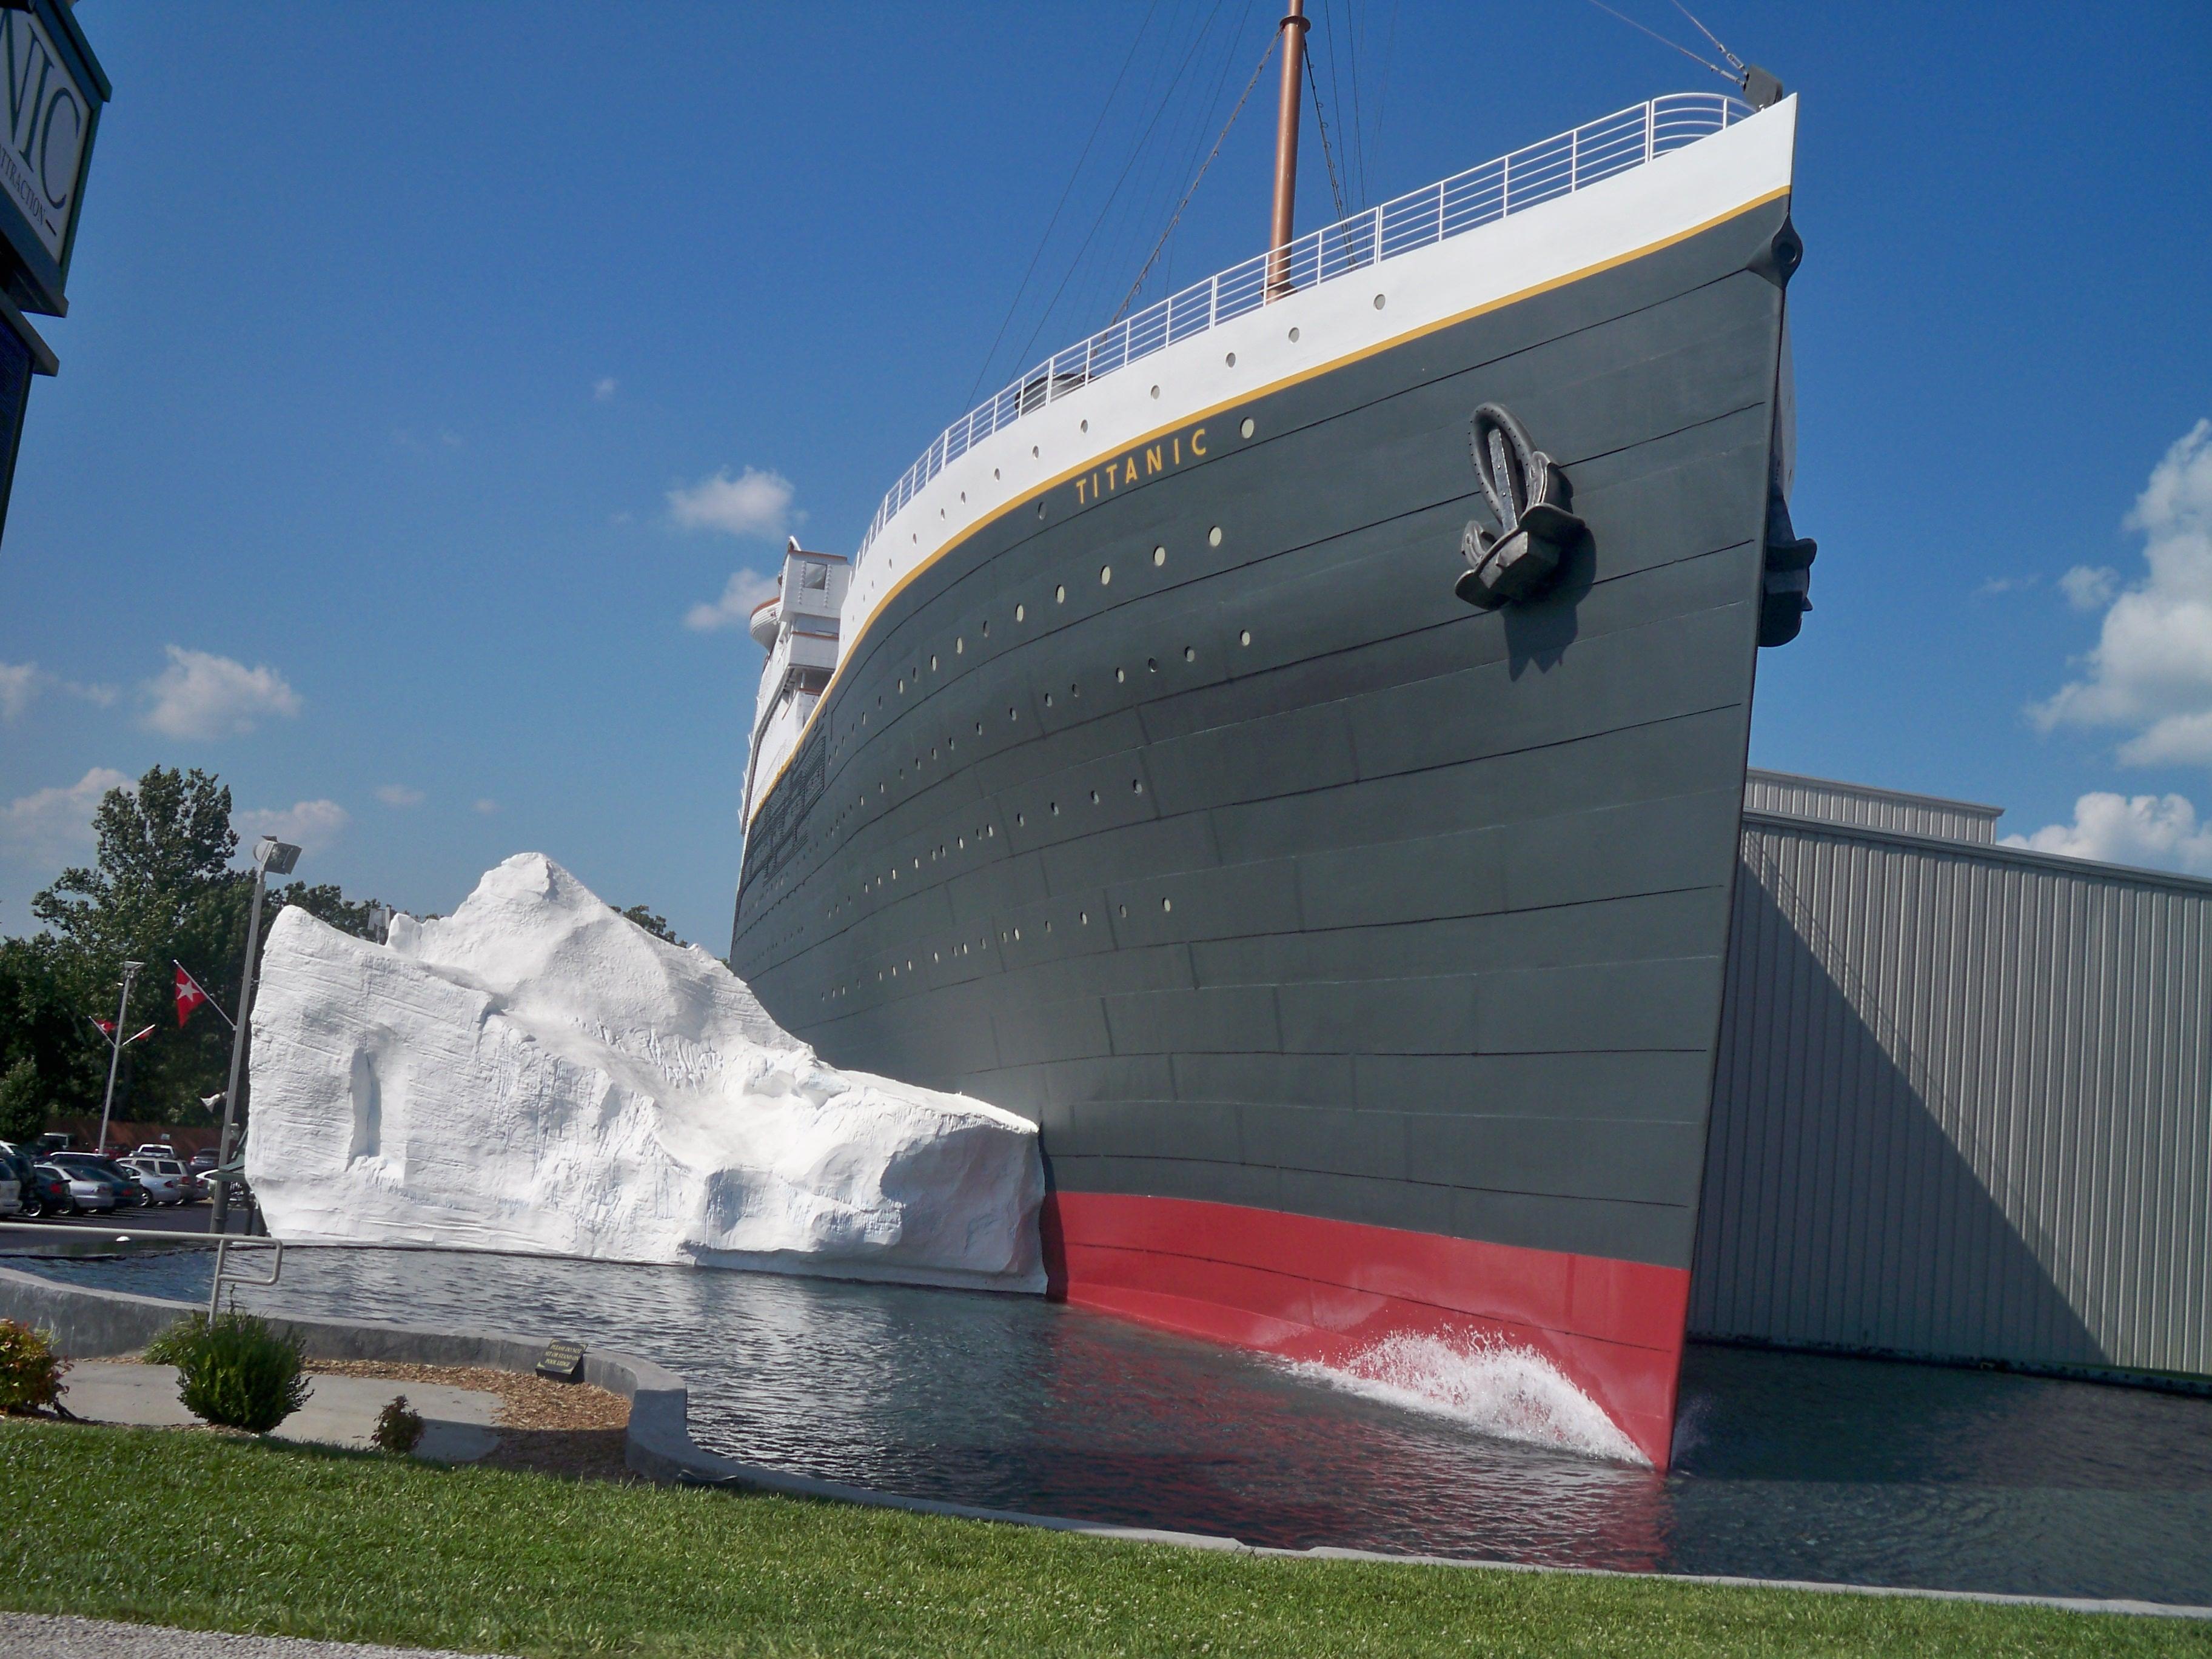 Exterior of the Titanic